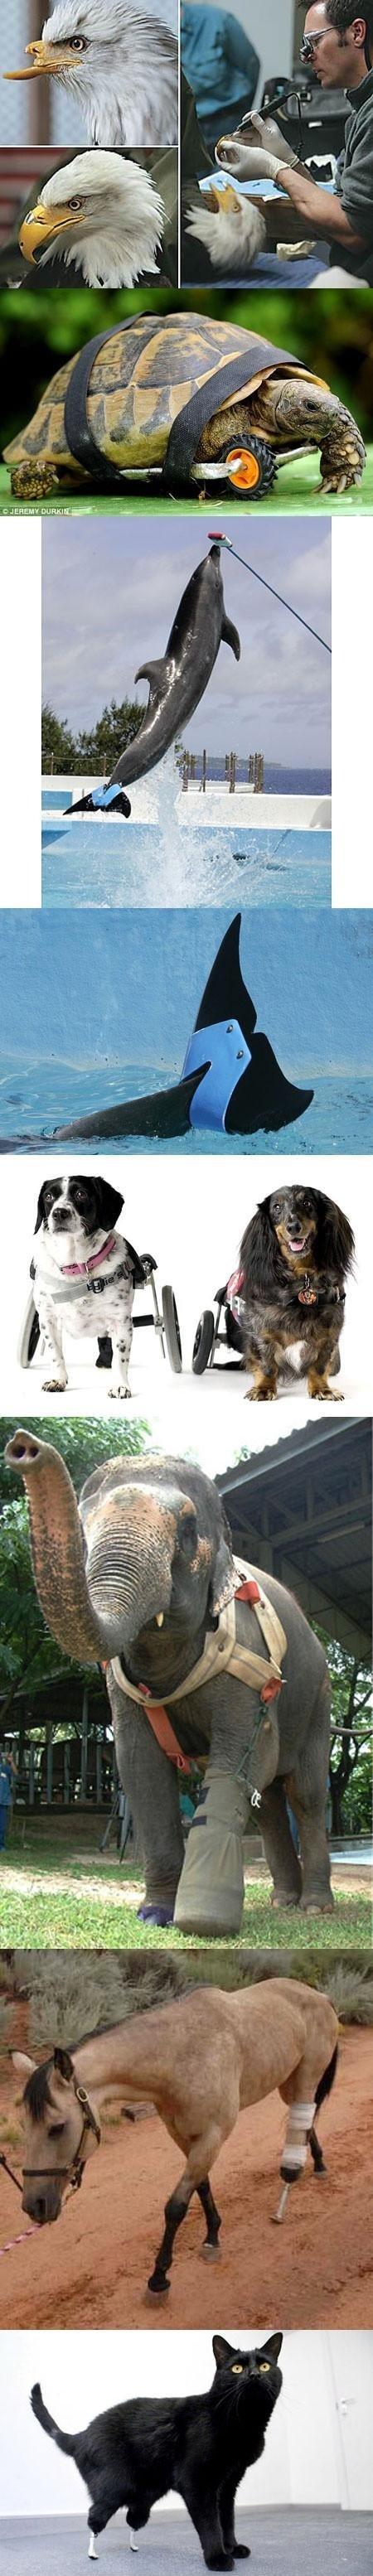 Animal prosthesis. not oc just awesomeness.